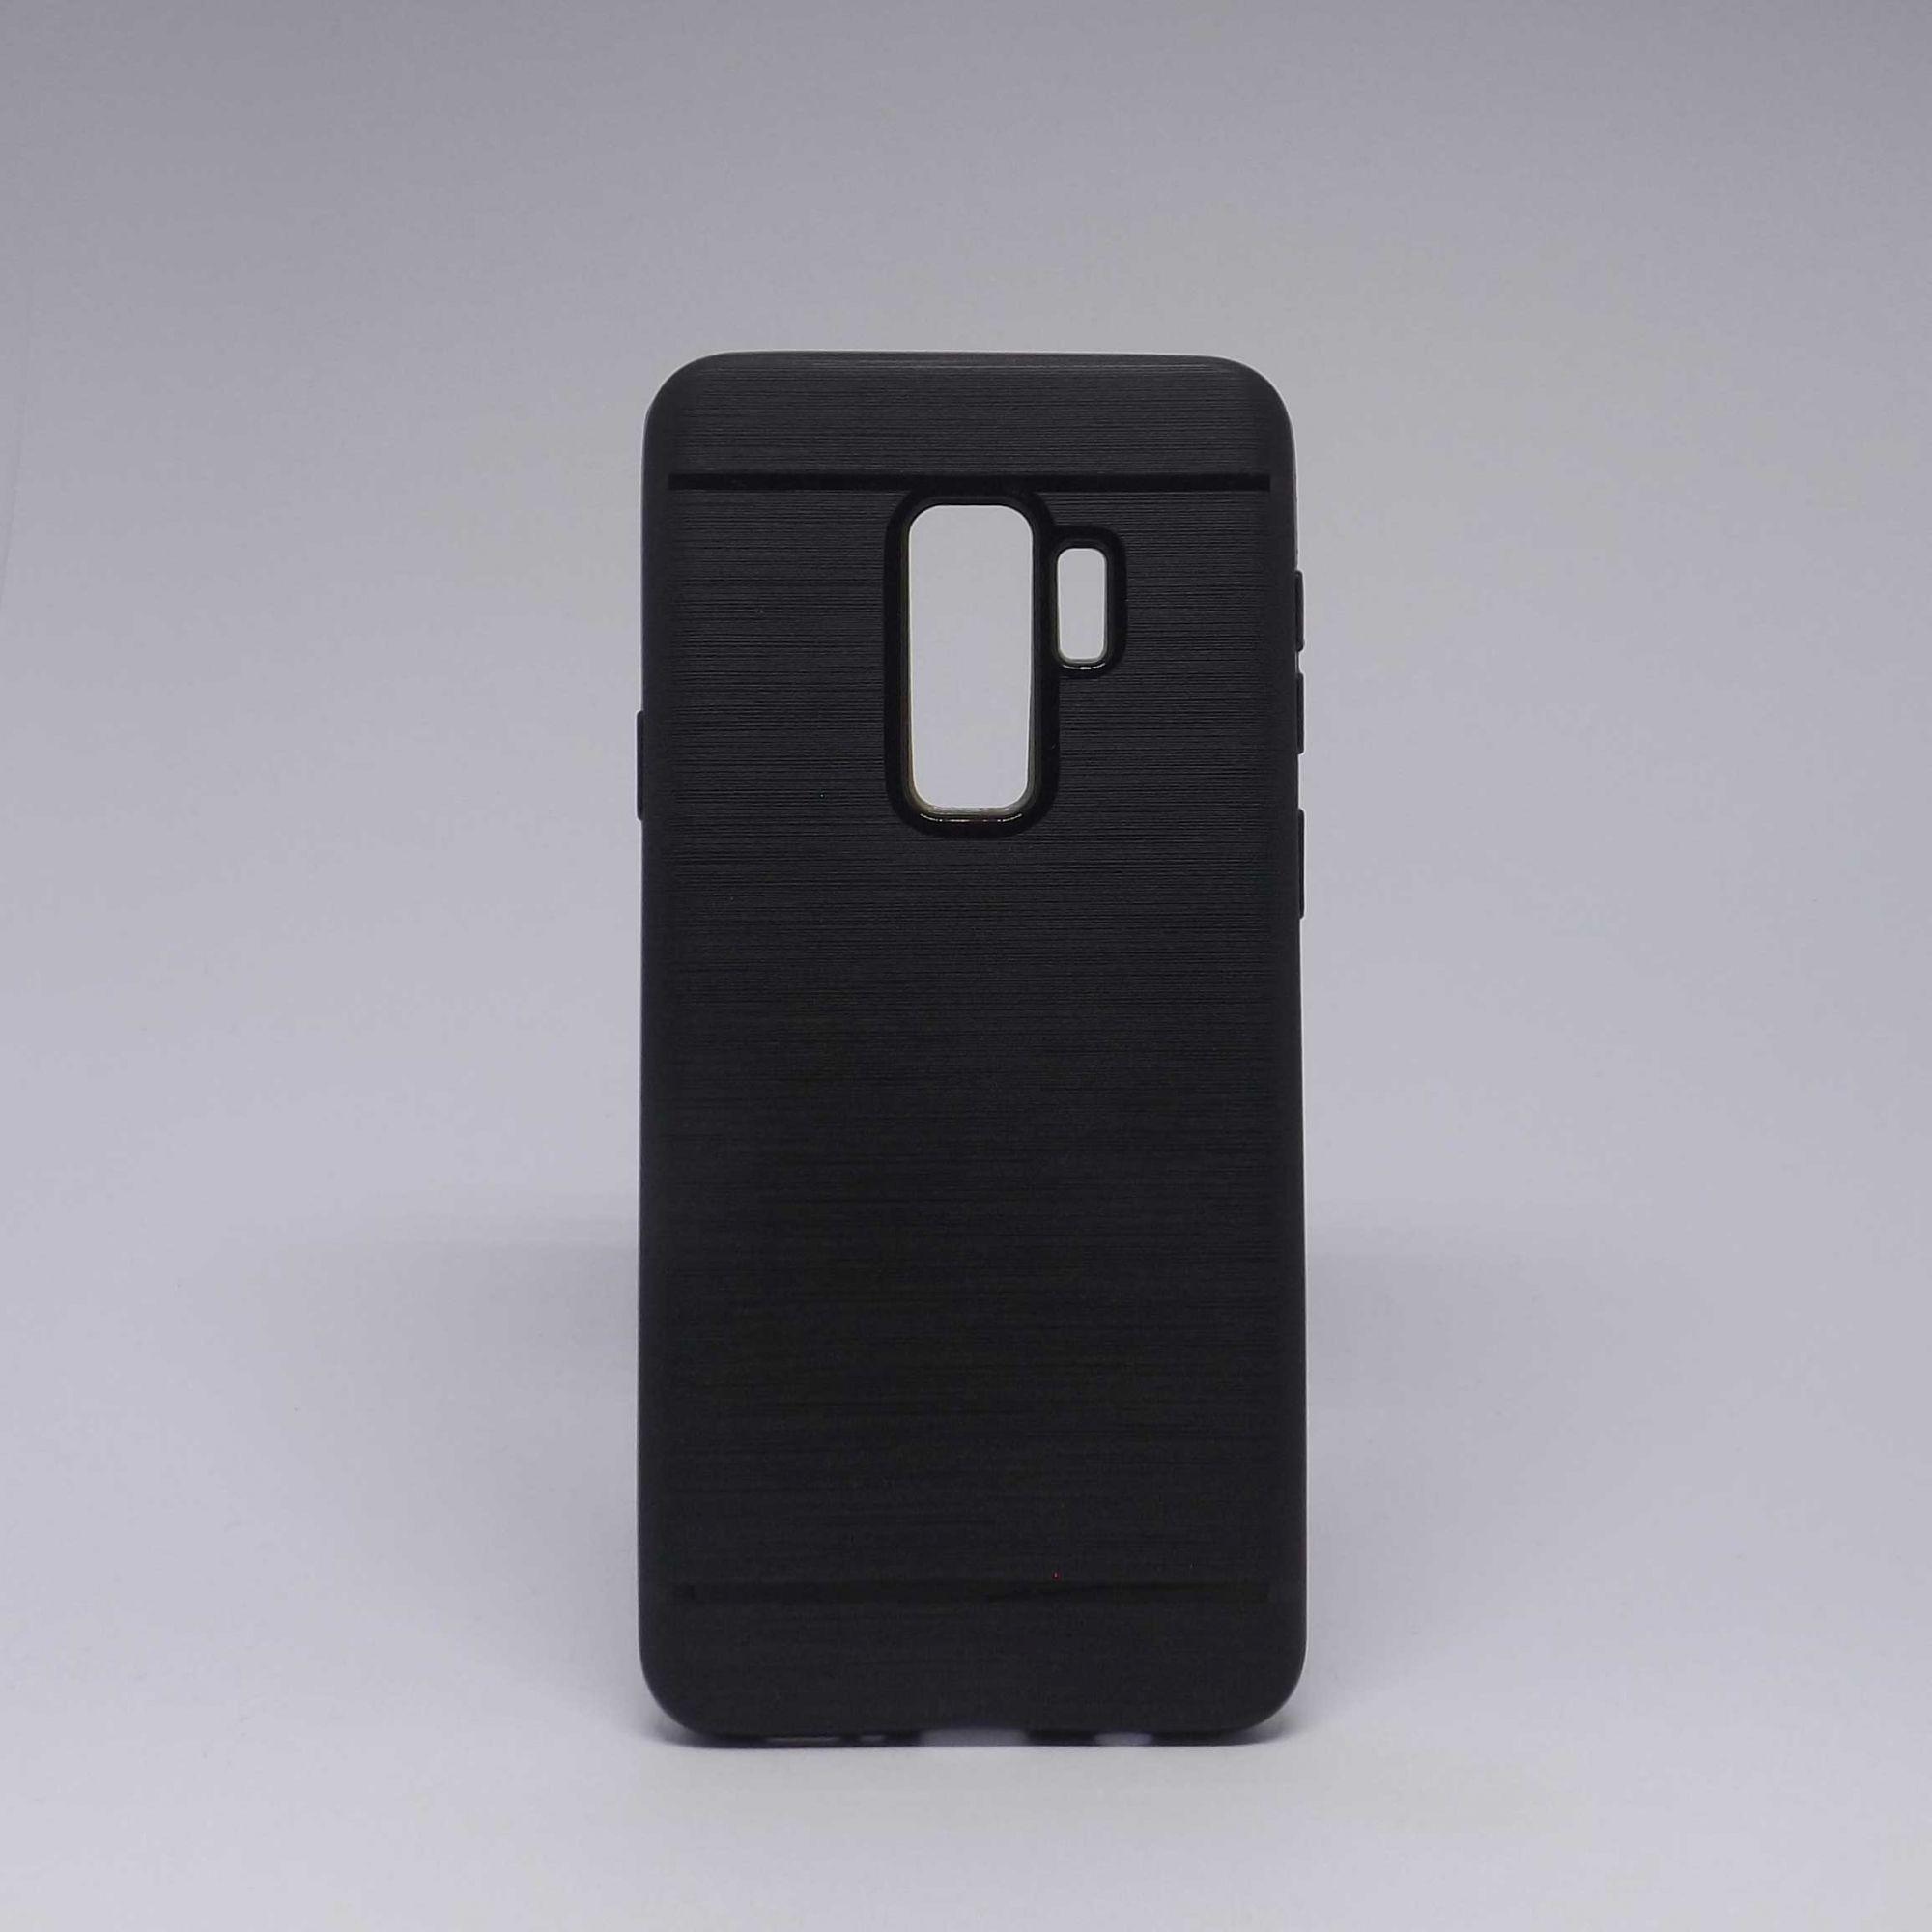 Capa Samsung Galaxy S9 Plus Preta Molinha